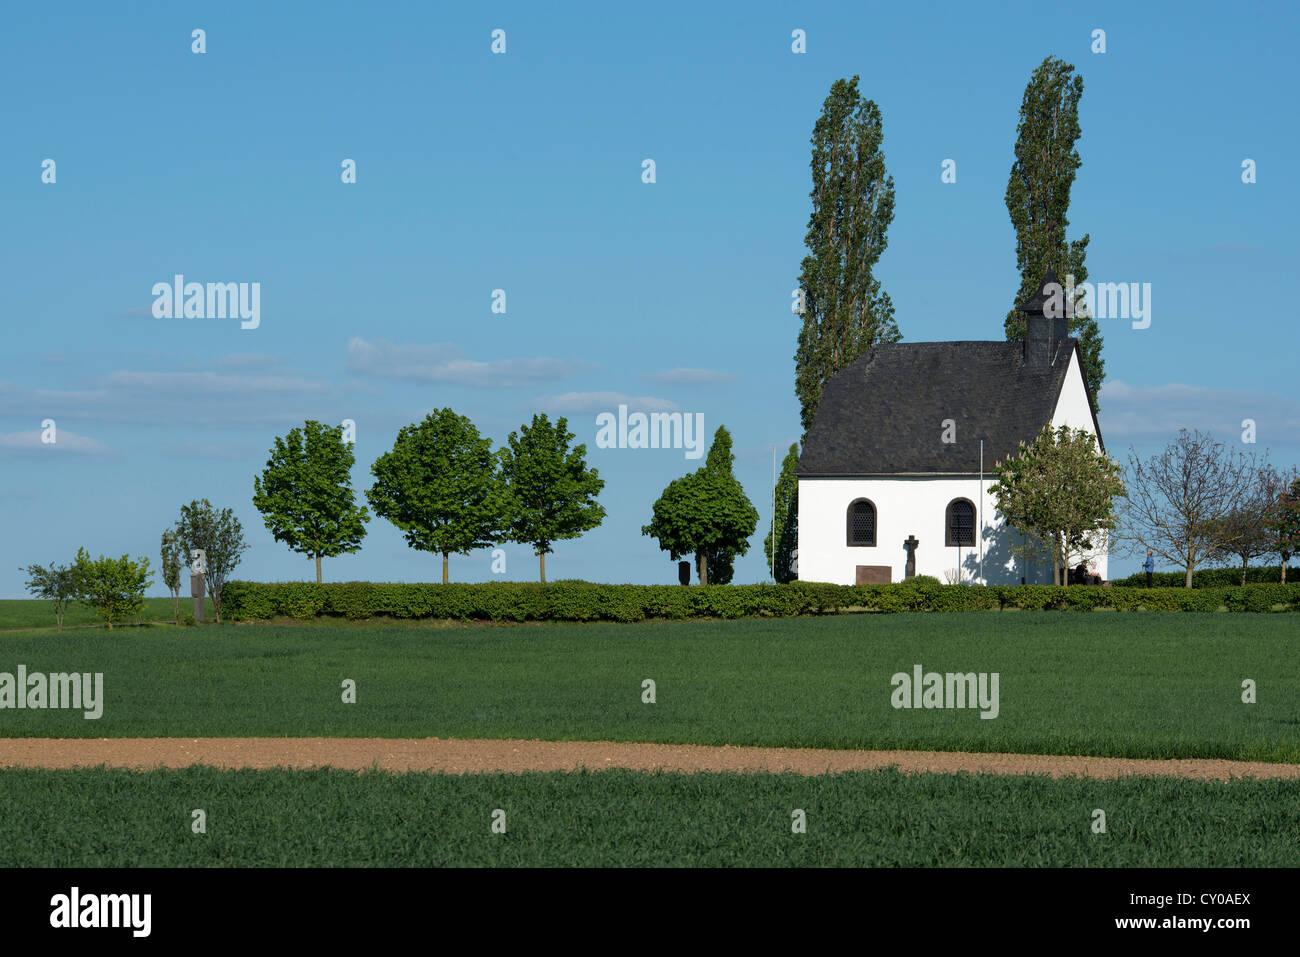 Heilig Kreuz Kapelle, capilla de la Santa Cruz, Mertloch, Renania-Palatinado, PublicGround Imagen De Stock